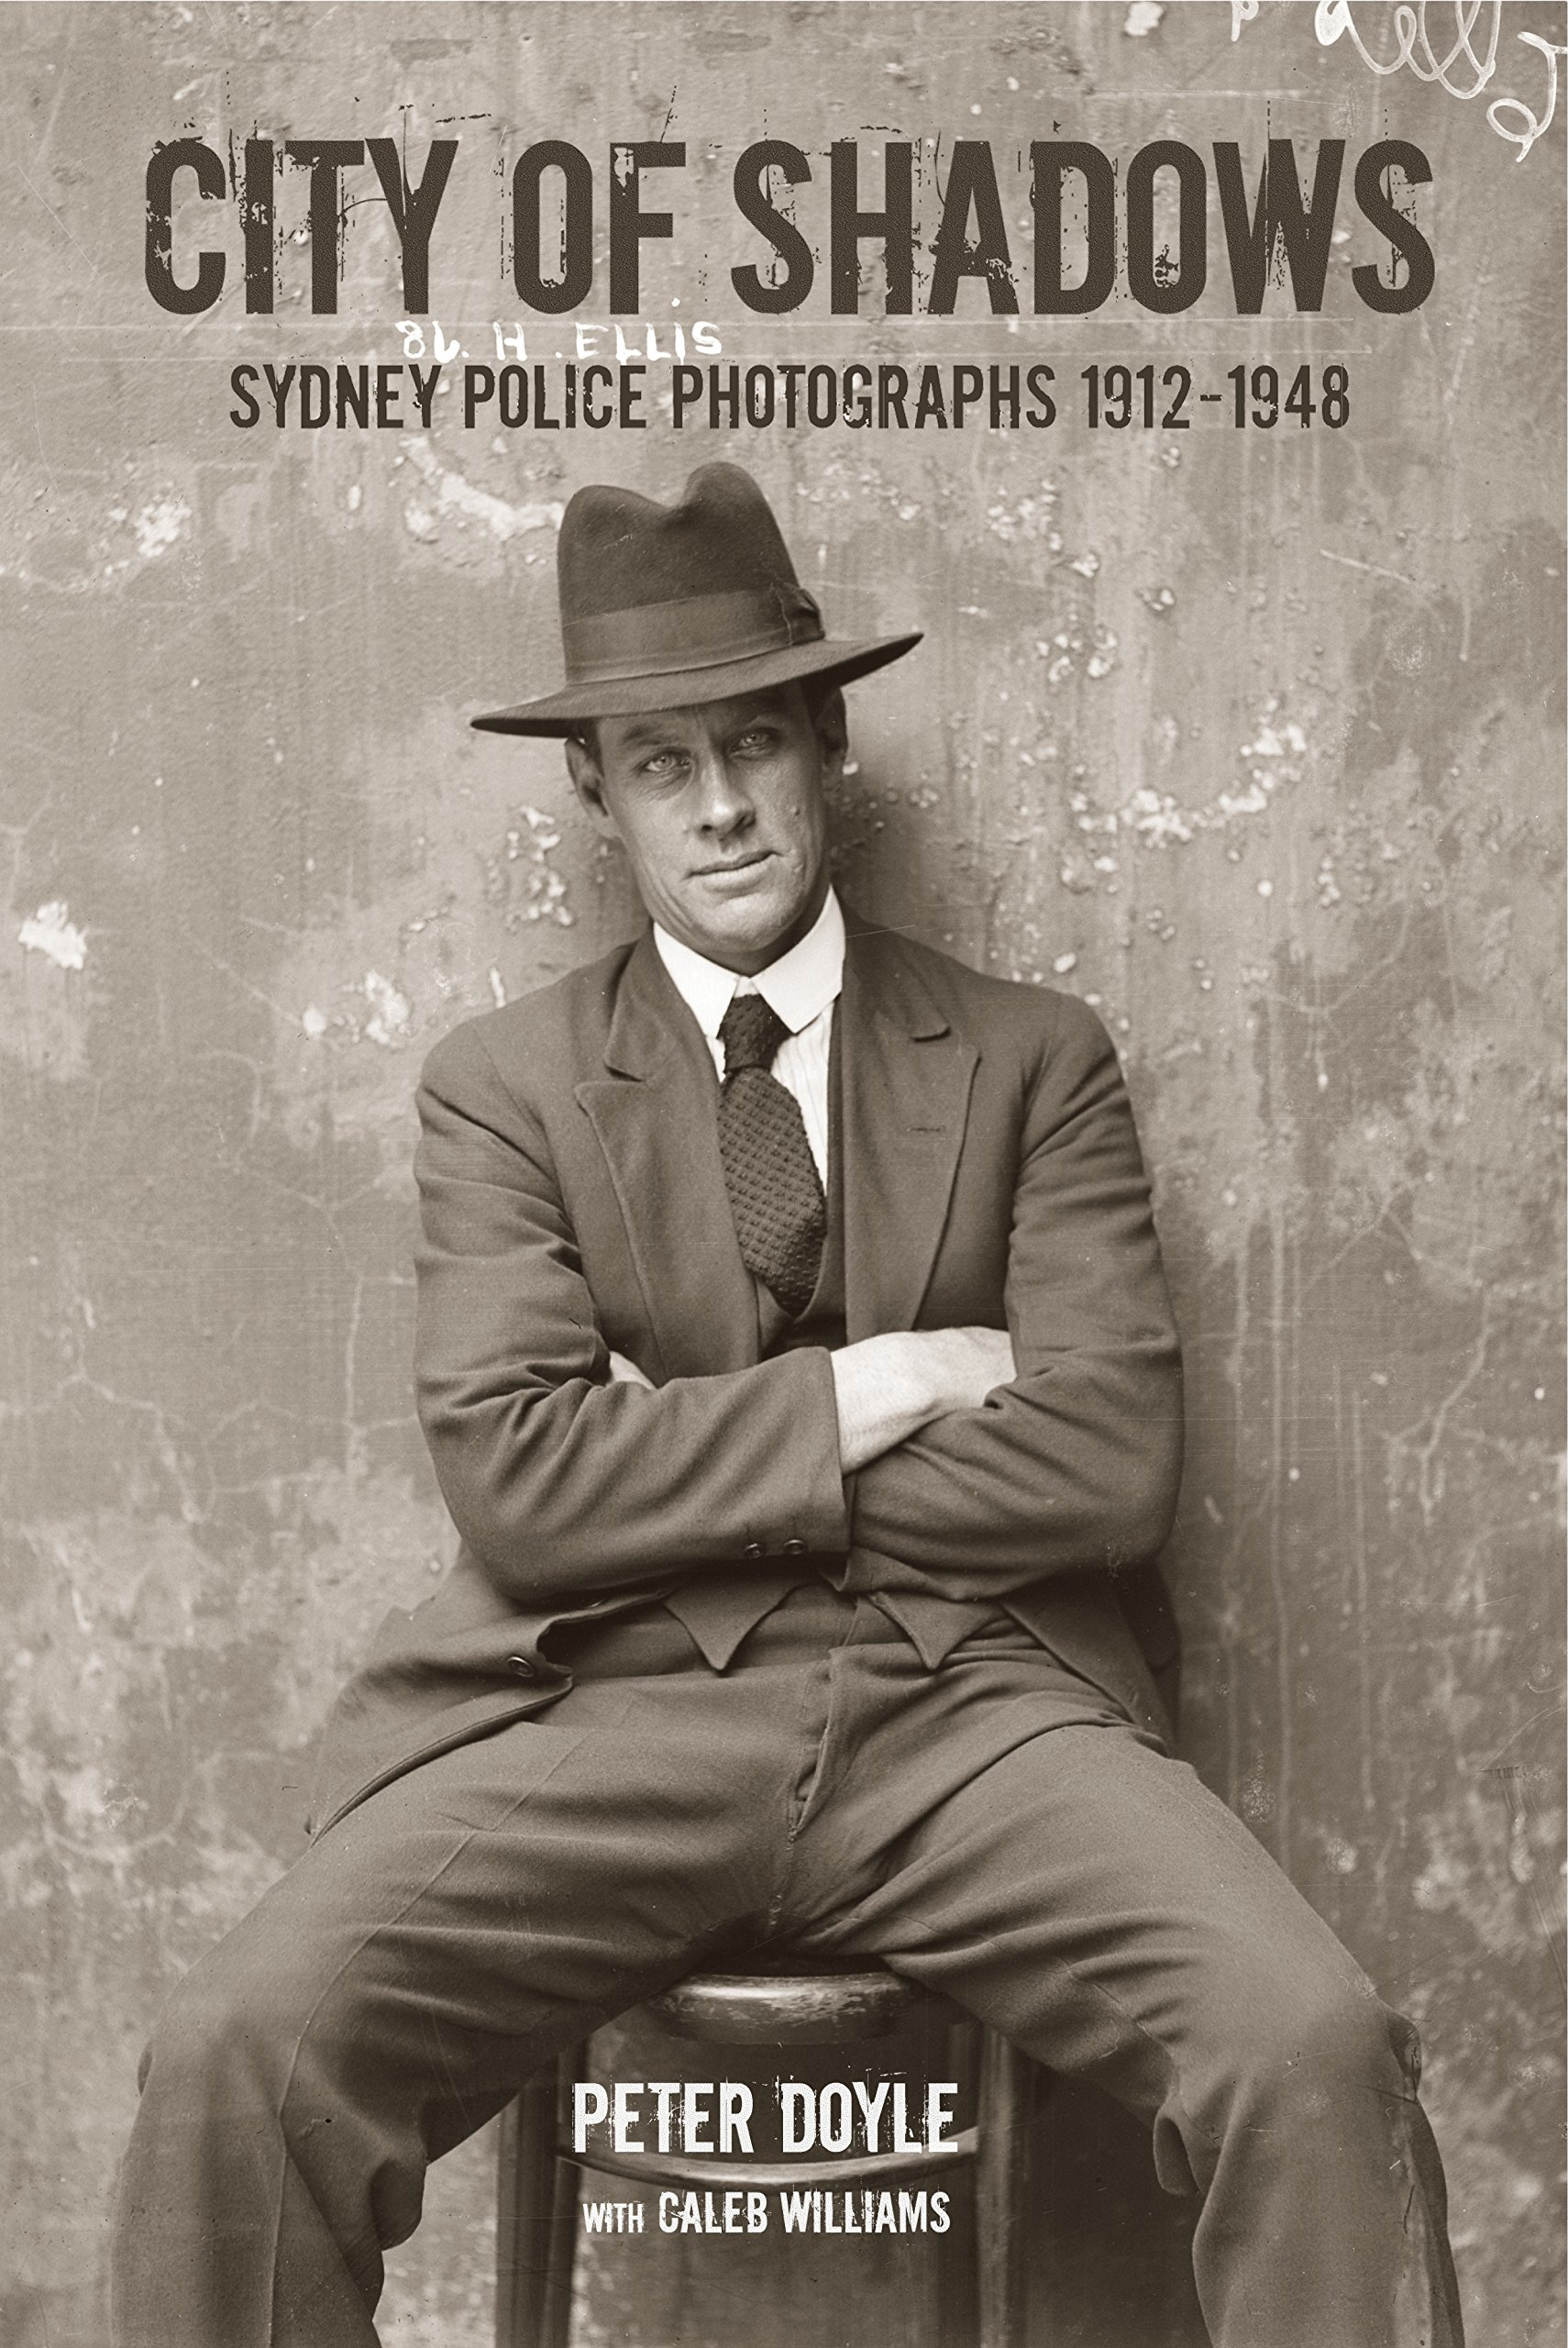 City of Shadows: Sydney Police Photographs 1912-1948